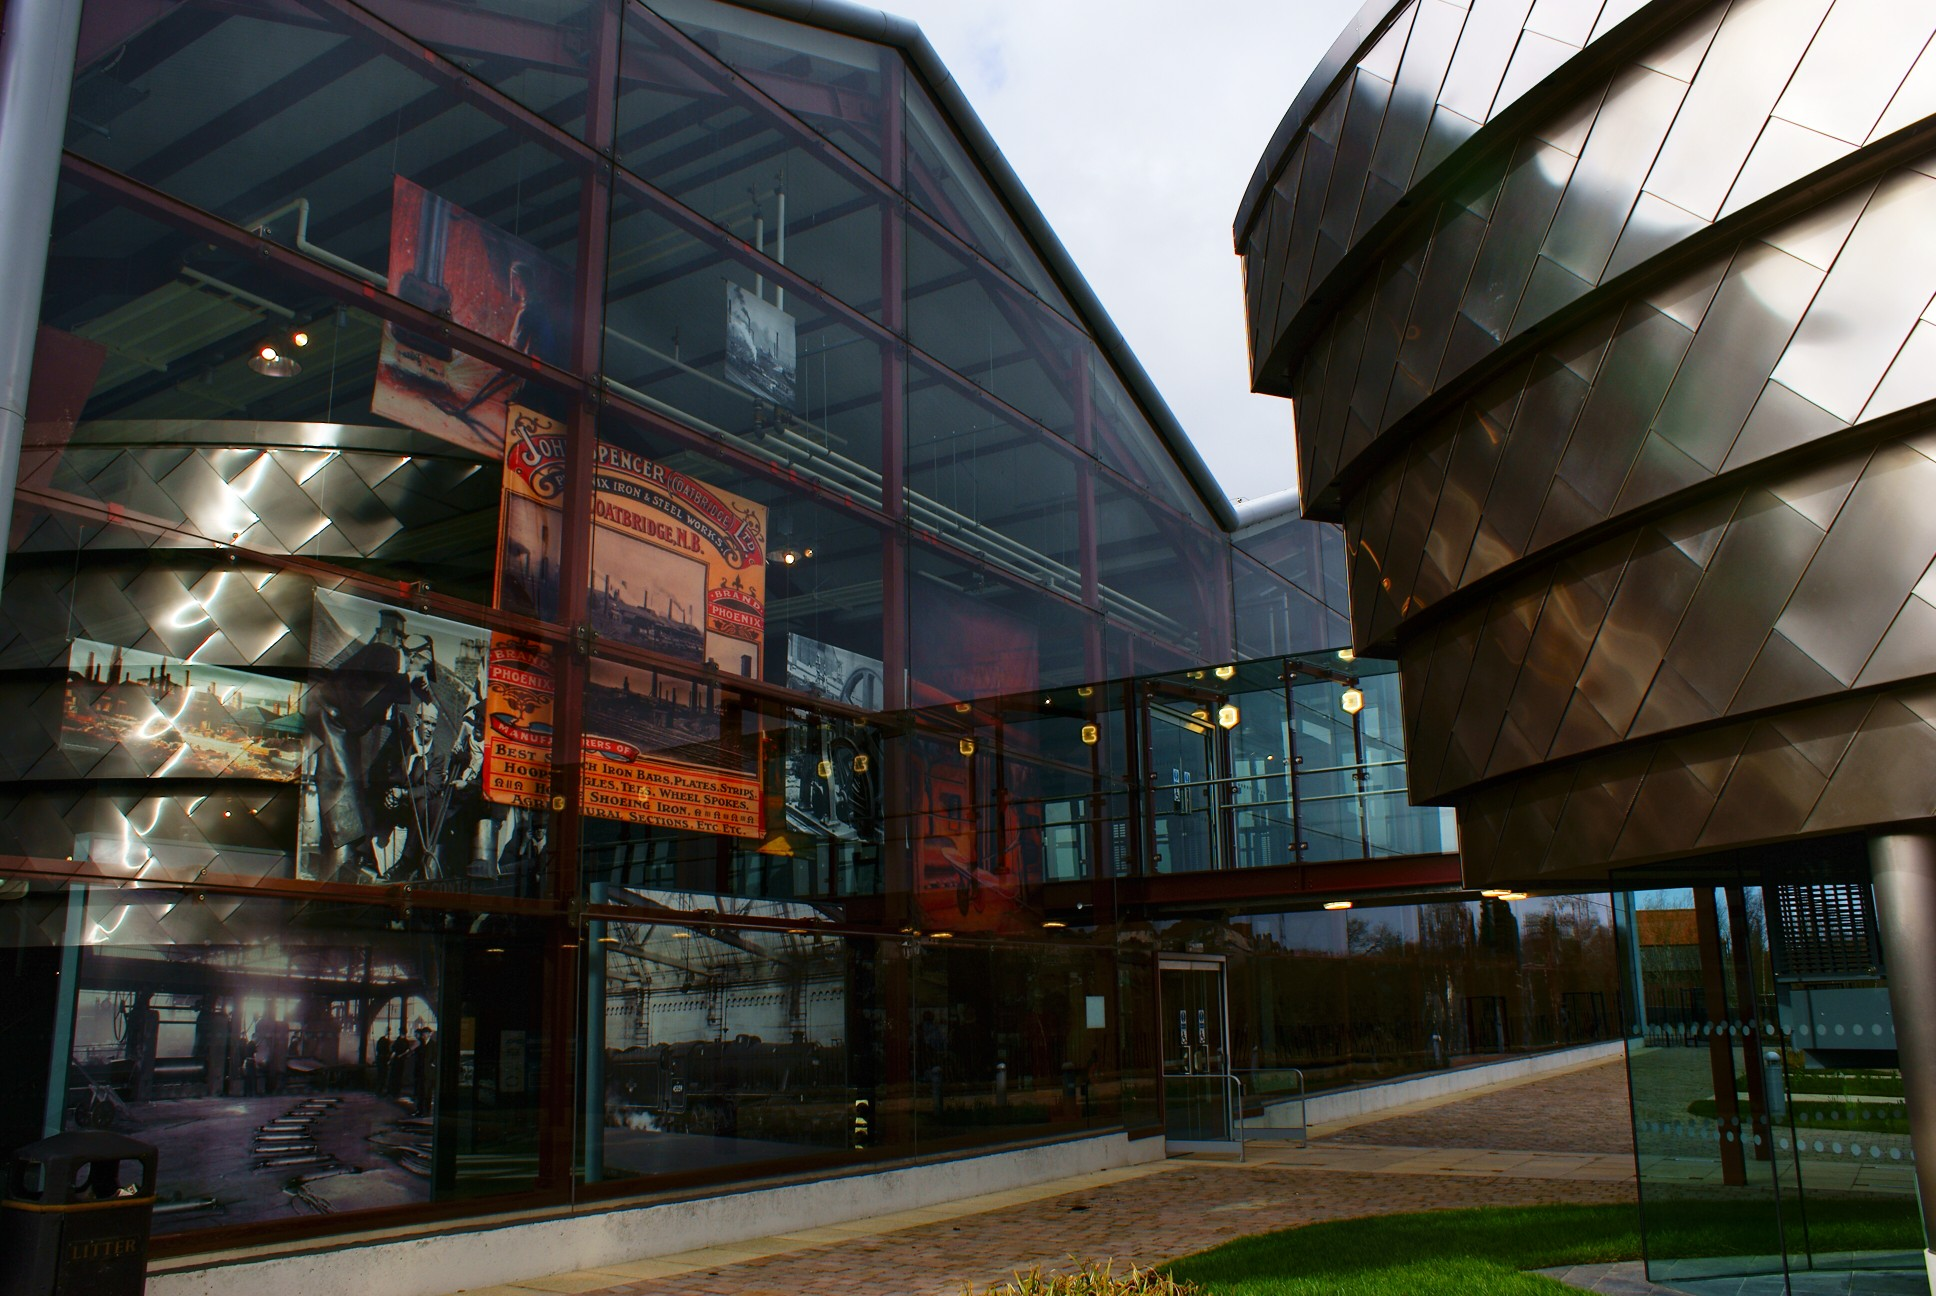 Summerlee, Museum of Scottish Industrial Life